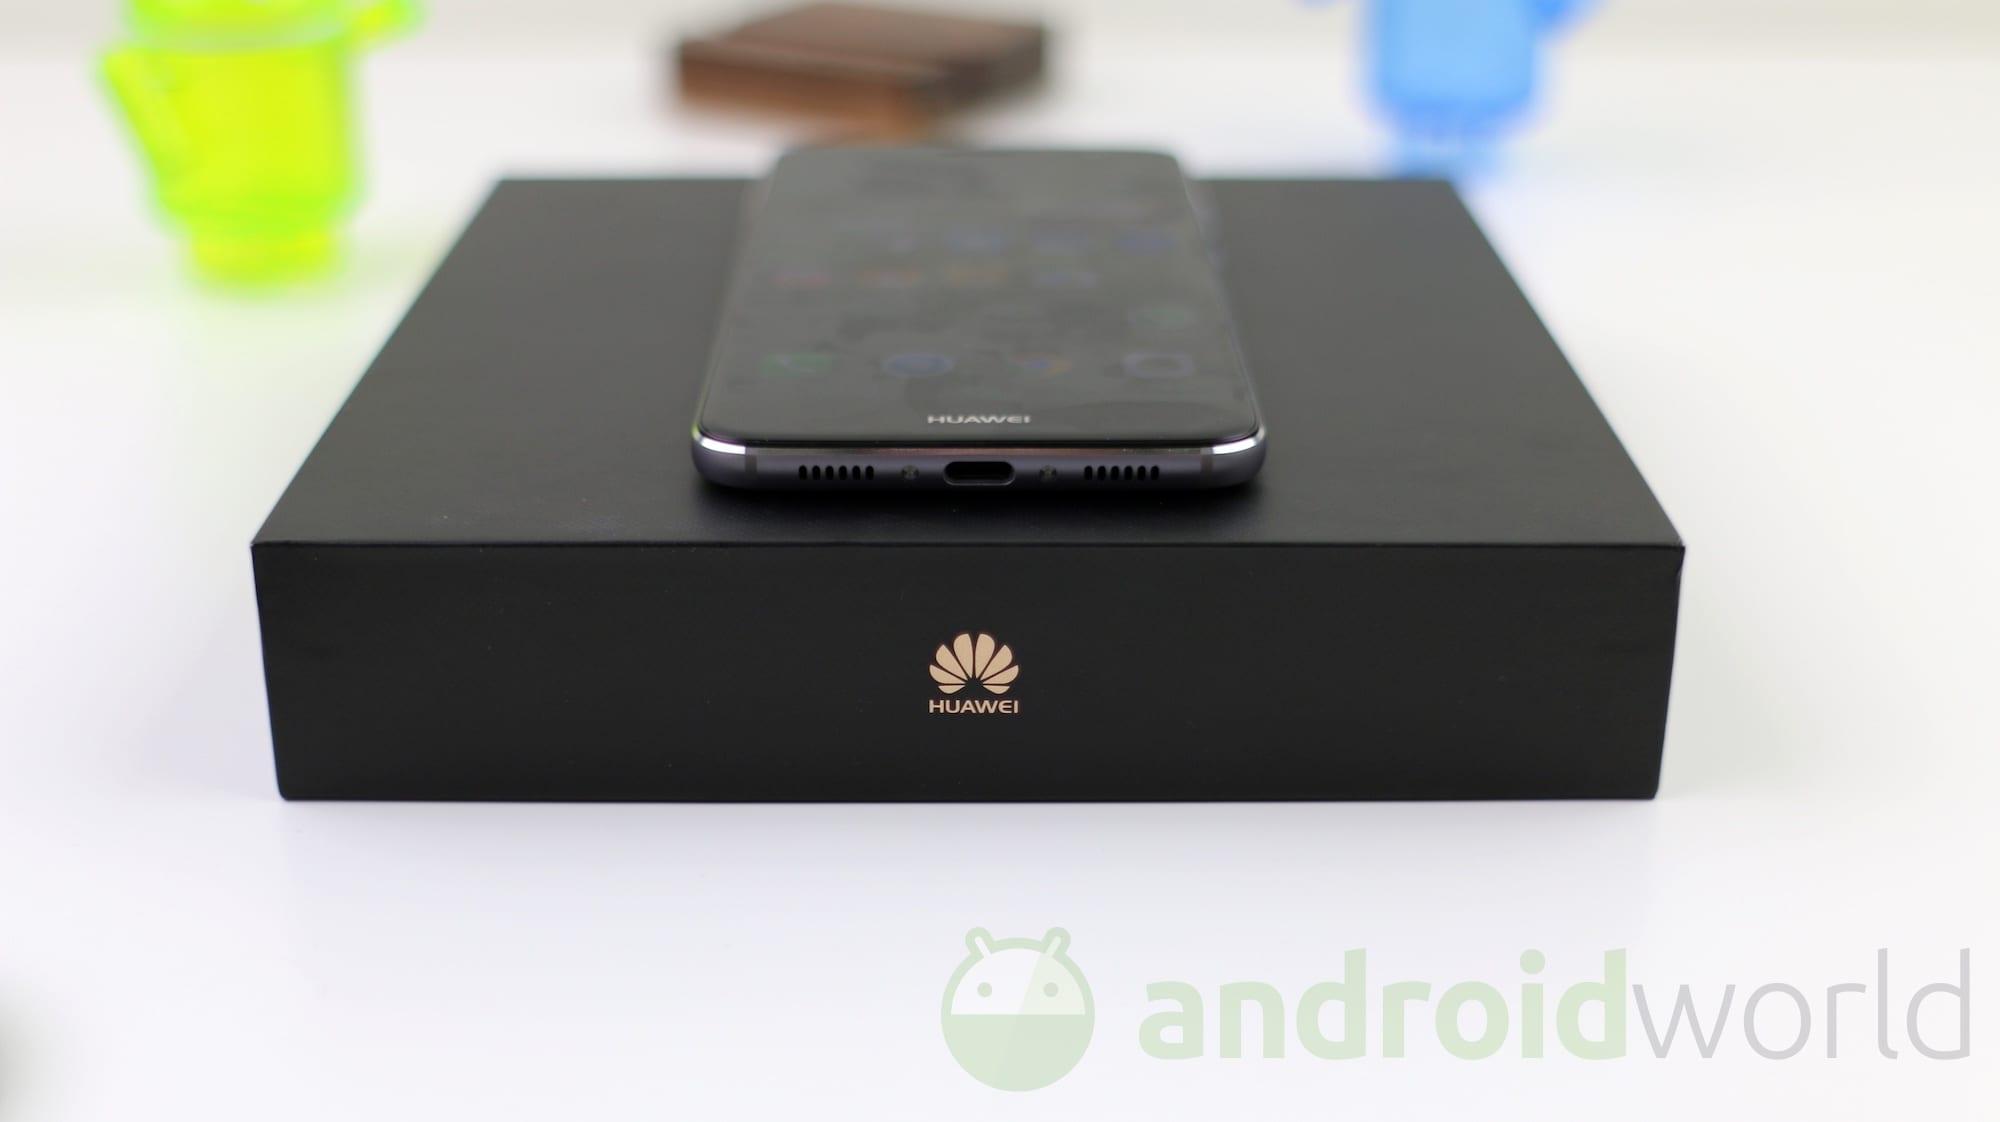 Huawei Nova Plus La Recensione Foto E Video Foto 1 Di 4